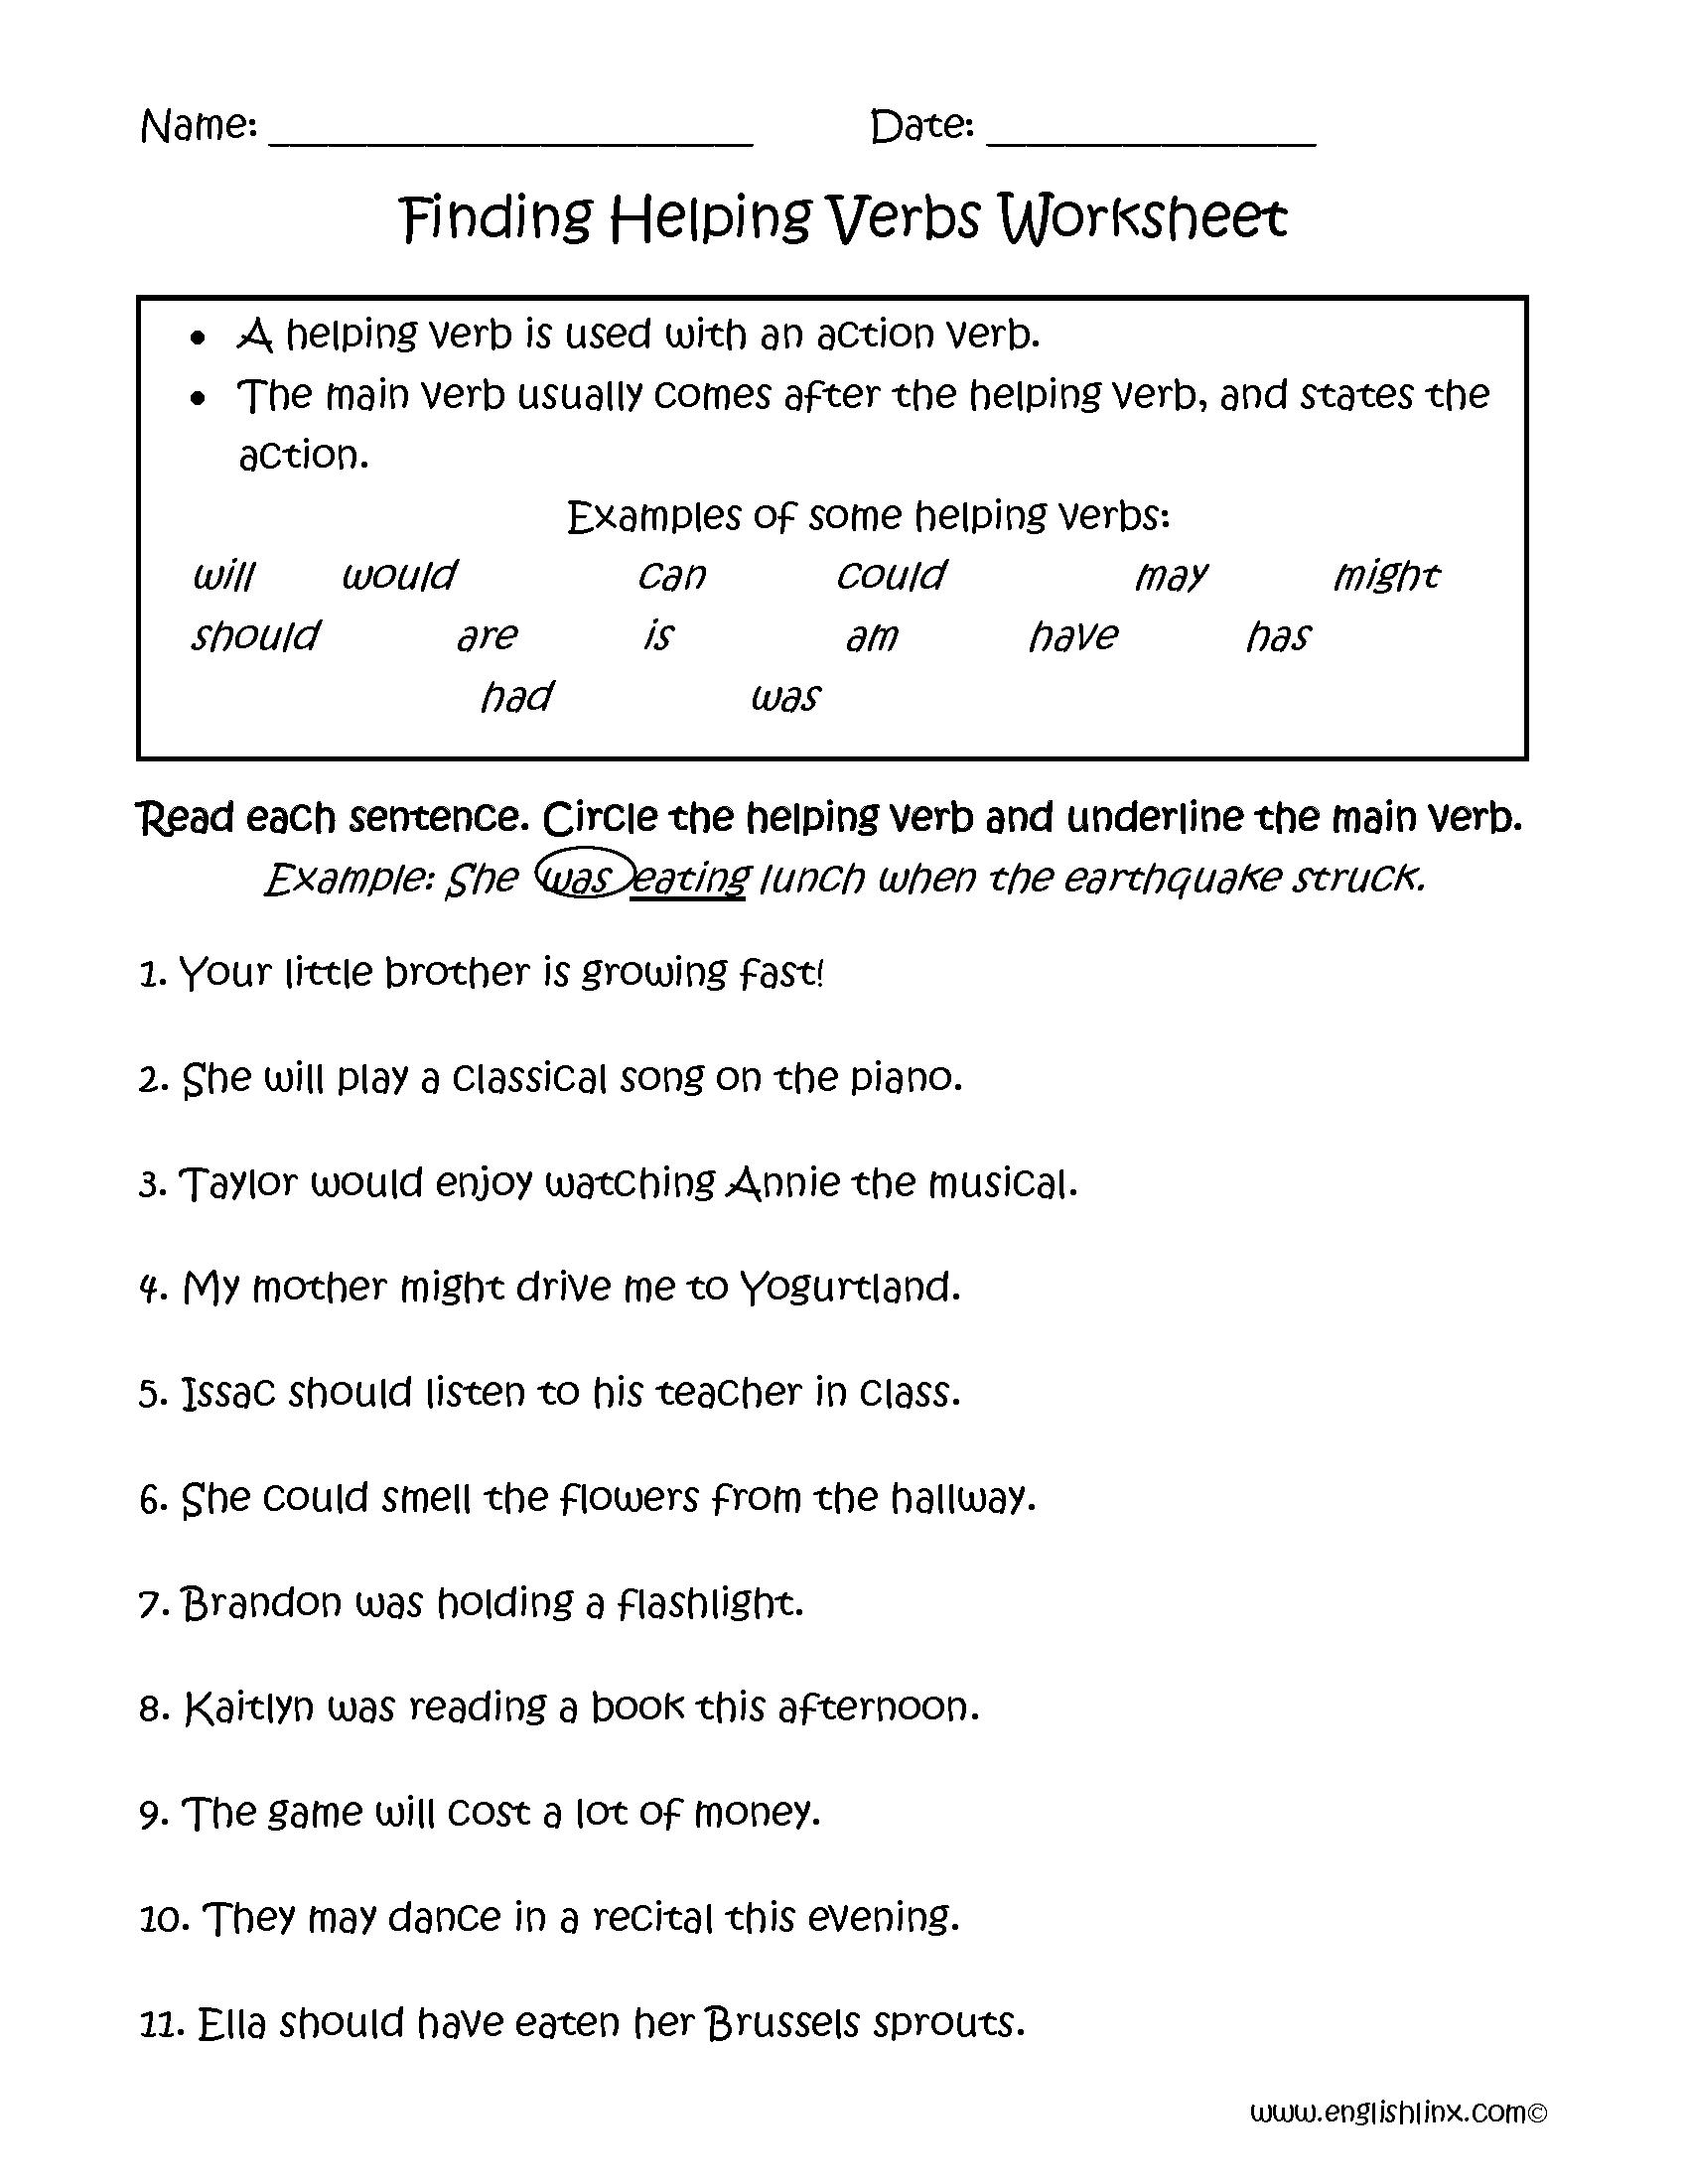 medium resolution of Verbs Worksheets   Helping Verbs Worksheets   Helping verbs worksheet